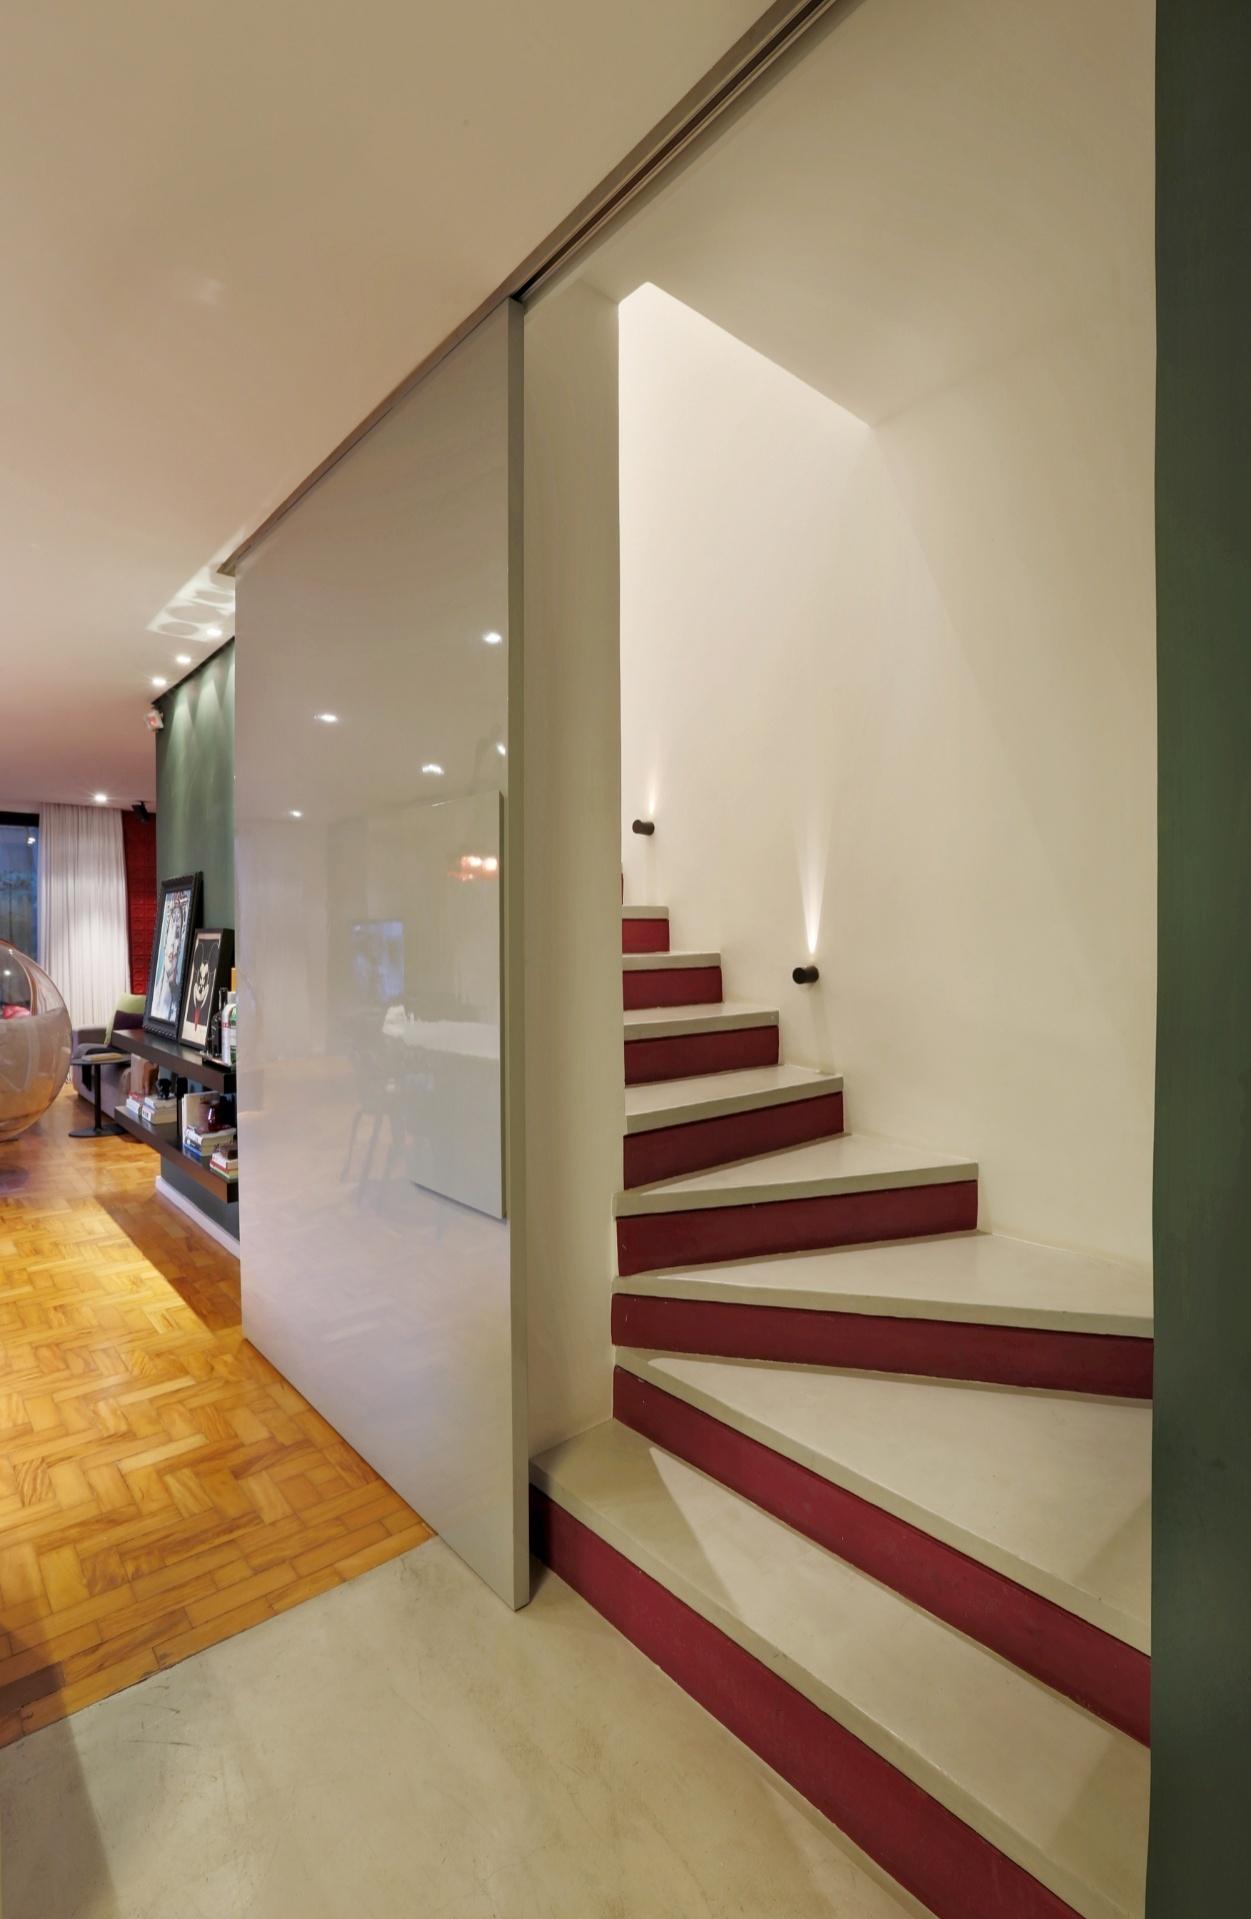 quando-aberta-a-porta-de-correr-que-isola-a-escada-de-acesso-ao-pavimento-superior-intimo-o-armario-para-tacas-e-loucas-de-apoio-ao-jantar-fica-escondido-as-escadas-como-